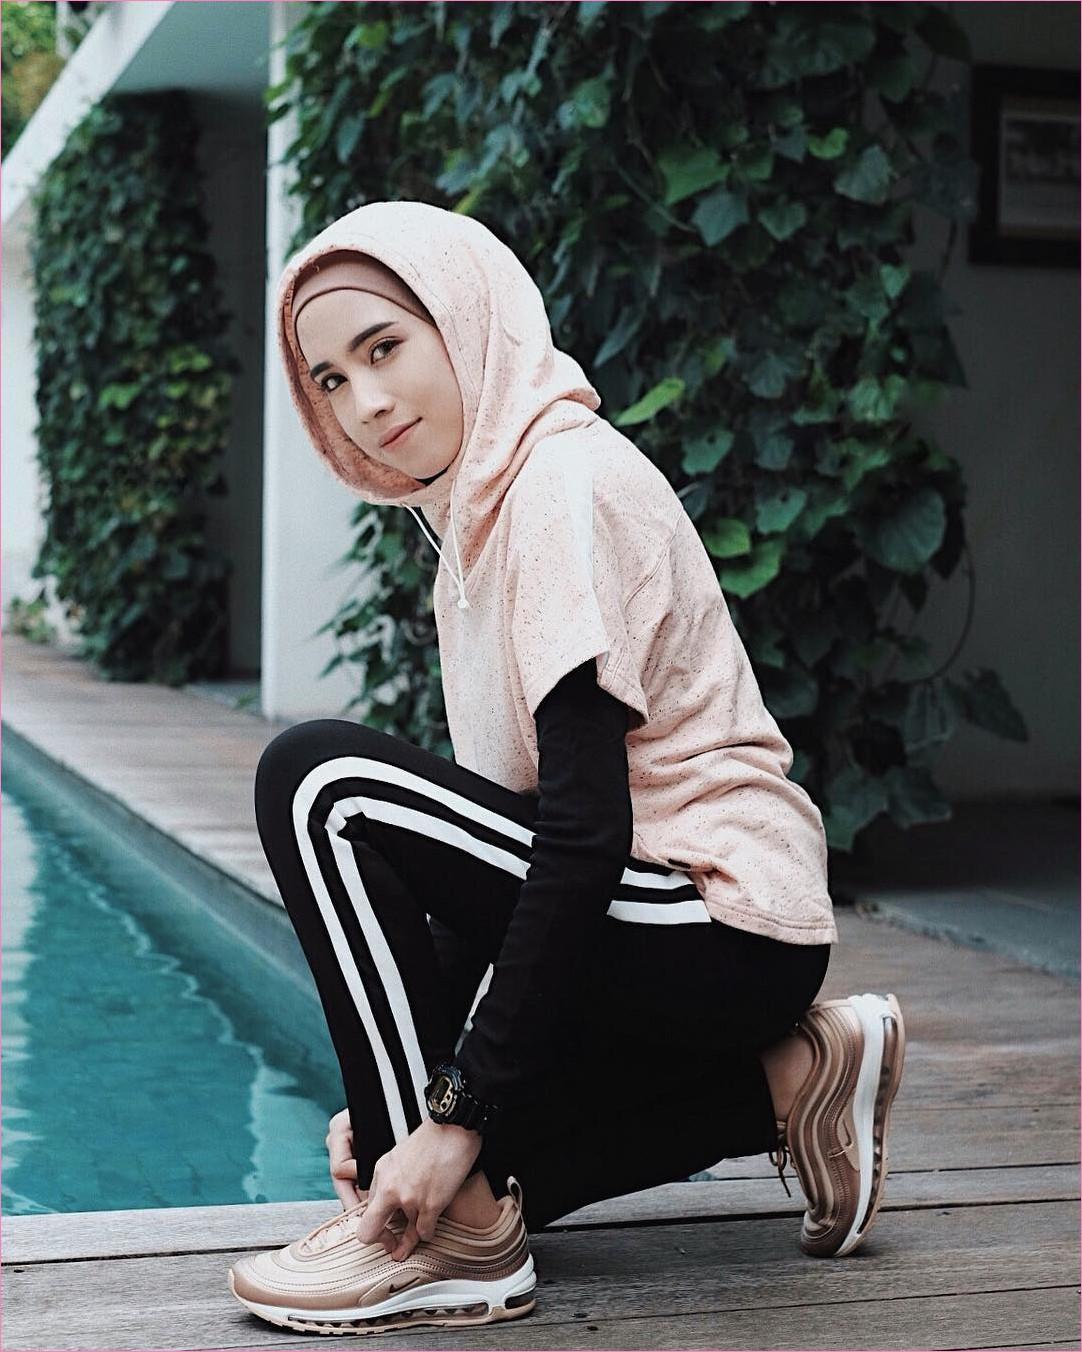 Outfit Baju Hijab Casual Untuk Olahraga Ala Selebgram 2018 sneakers kets sepatu olahraga turban jaket hoodie sweater krem legging celana training stripe jam tangan bulat putih hitam gaya casual kain katun rayon jogging goes 2018 kolam renang air biru tumbuhan merambat hijau kayu